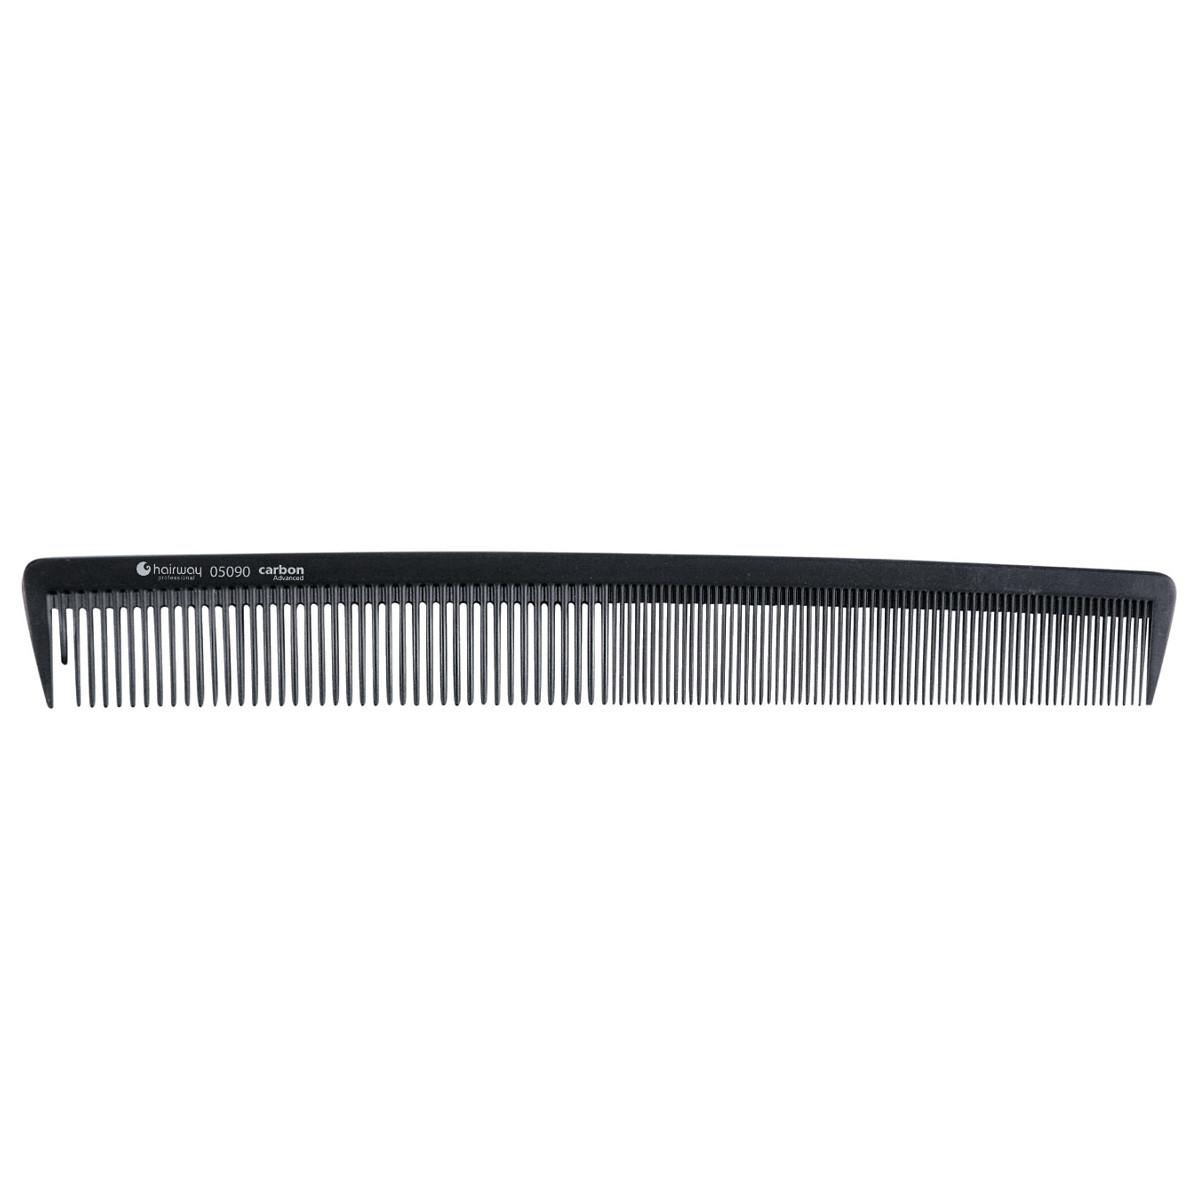 Гребень Hairway 05090 карбоновый гипоаллергенный 215 мм